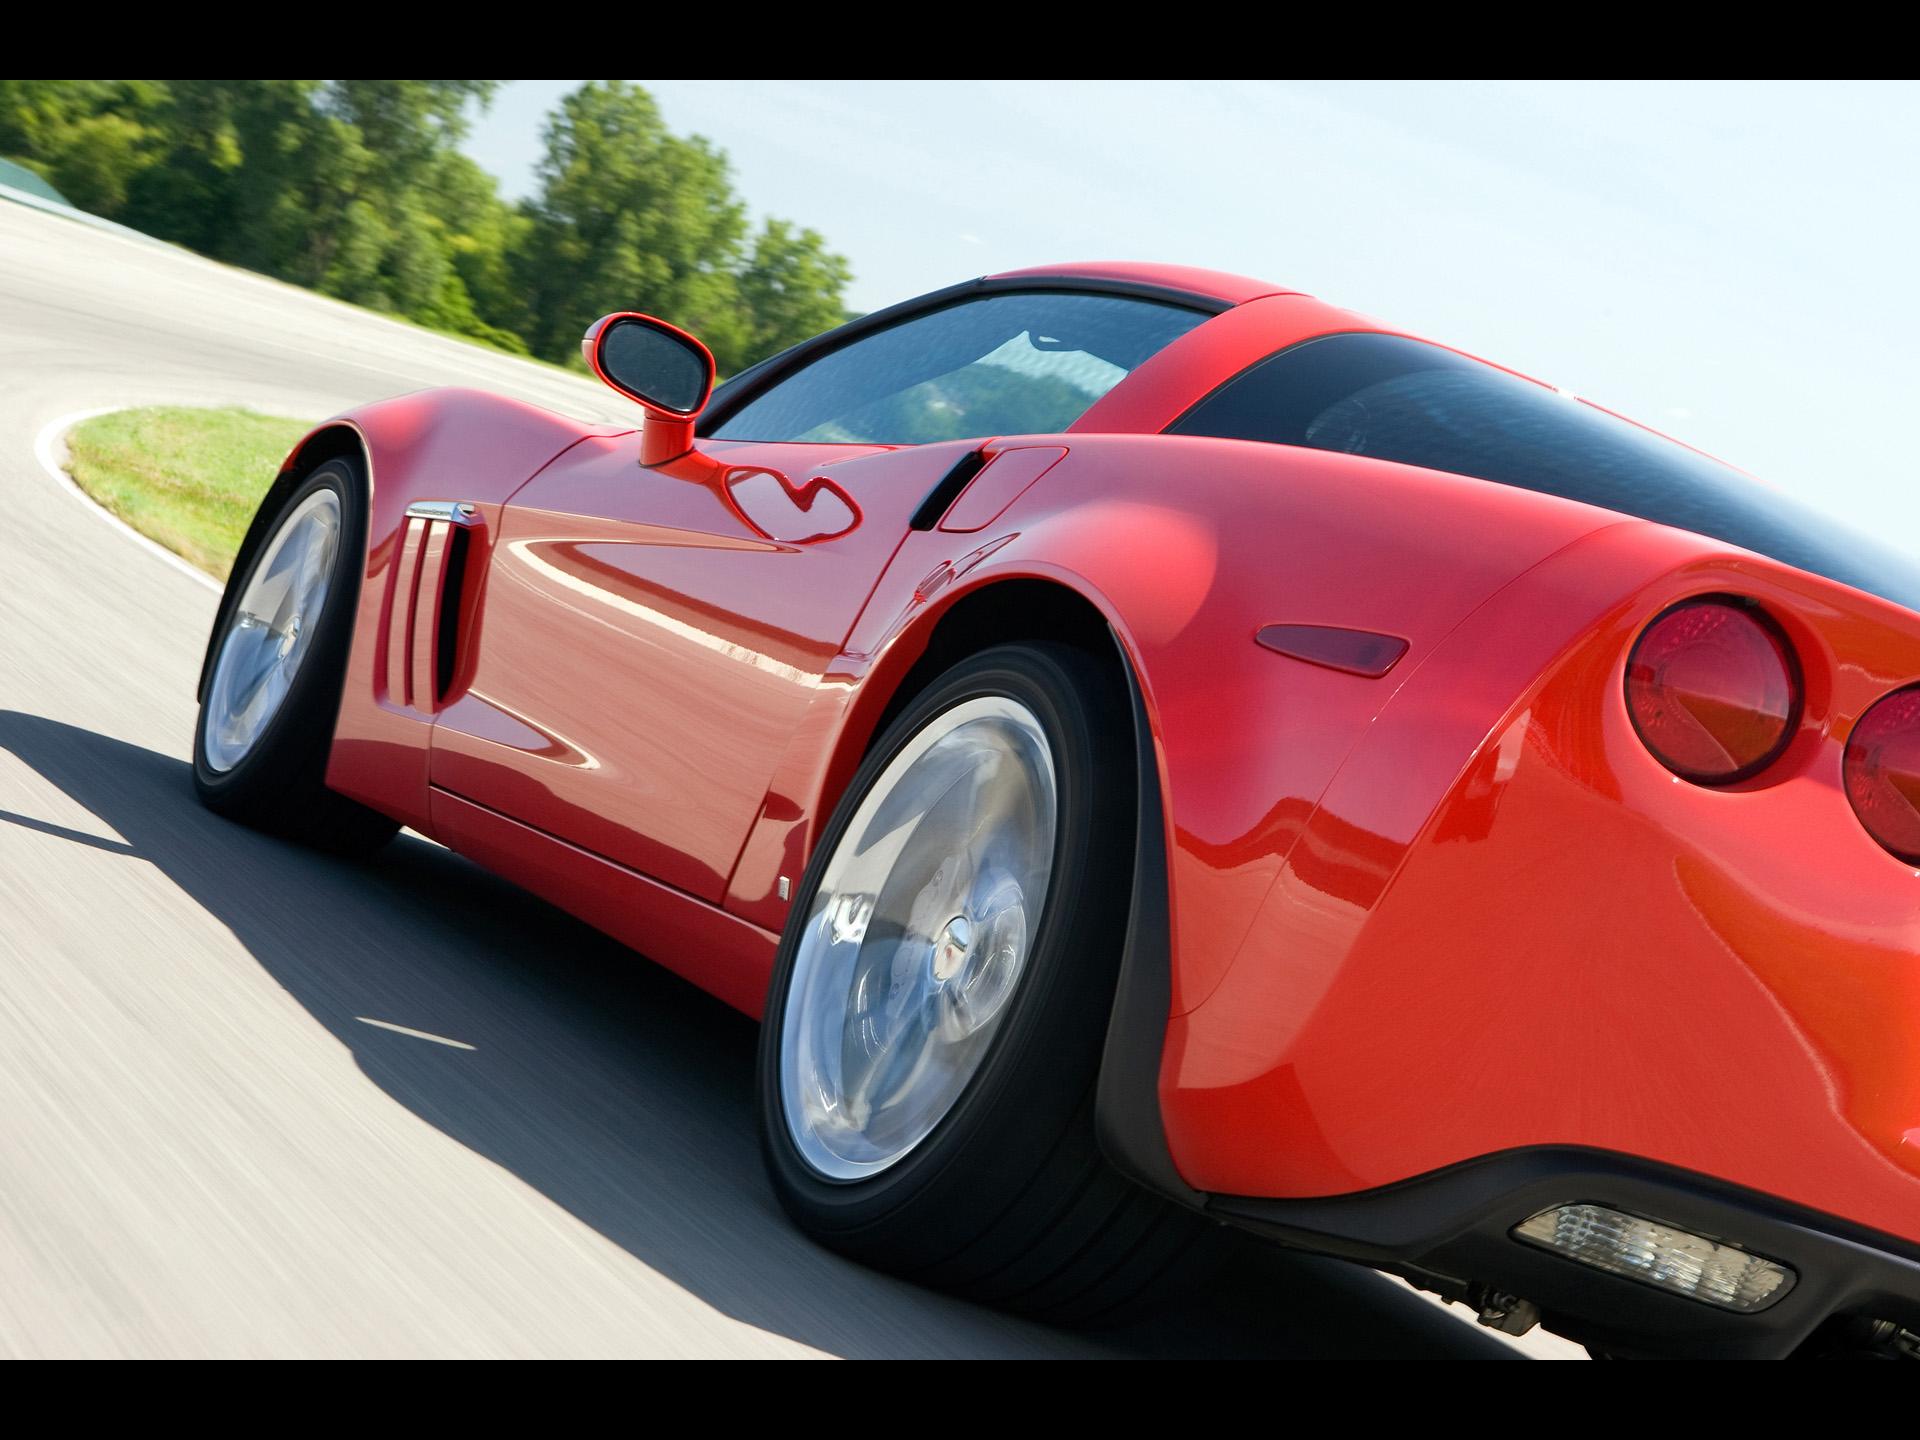 Corvette Grand Sport Iphone Wallpaper: 2013 Chevrolet Corvette Grand Sport Full HD Wallpaper And